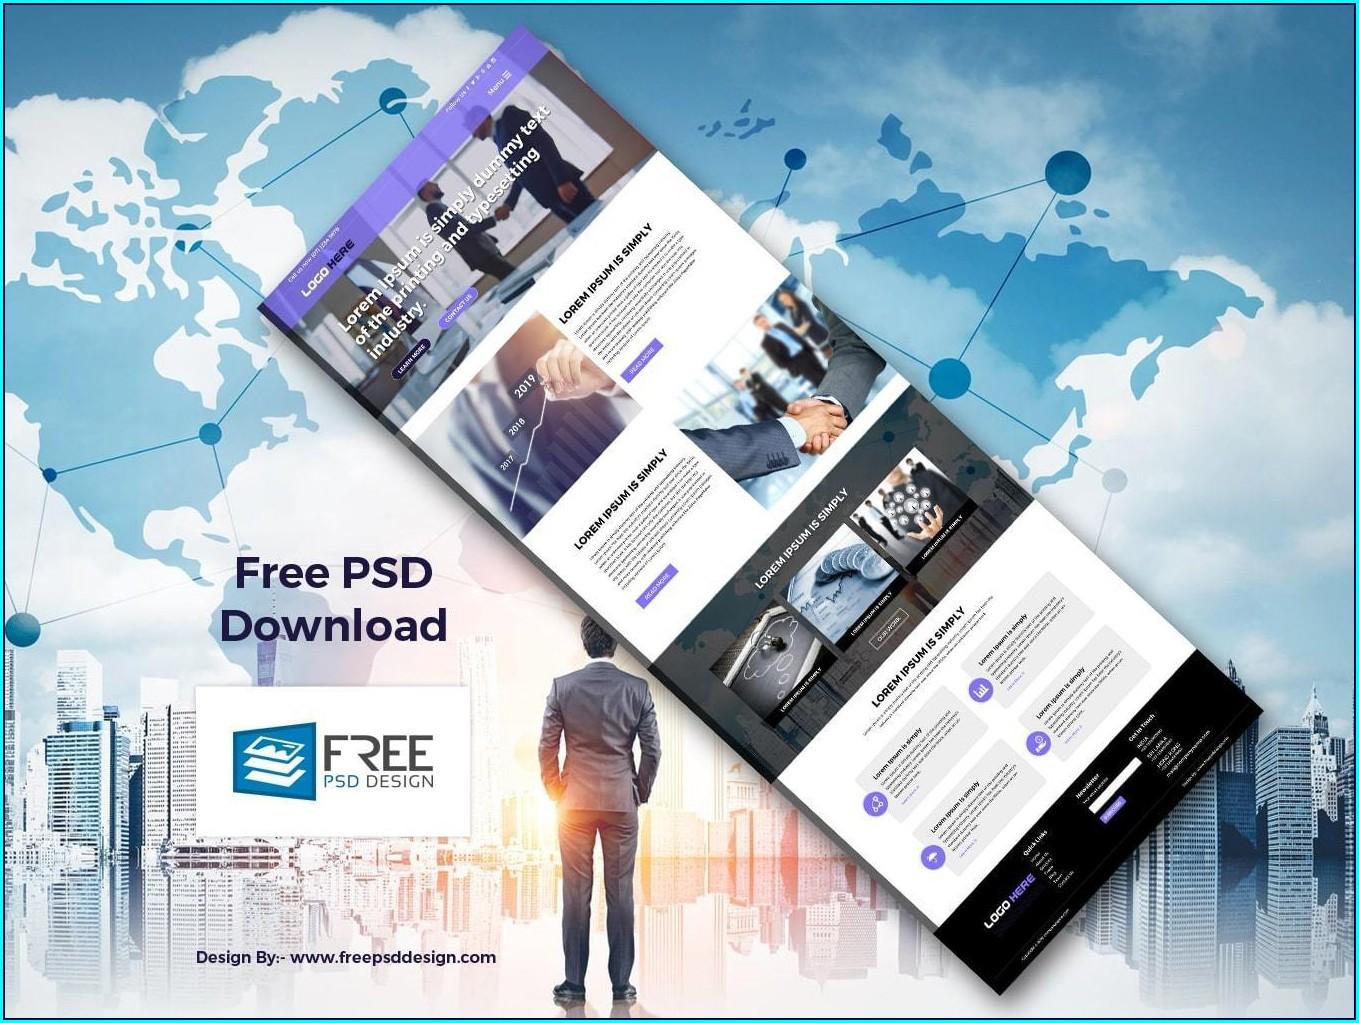 B2b Website Templates Free